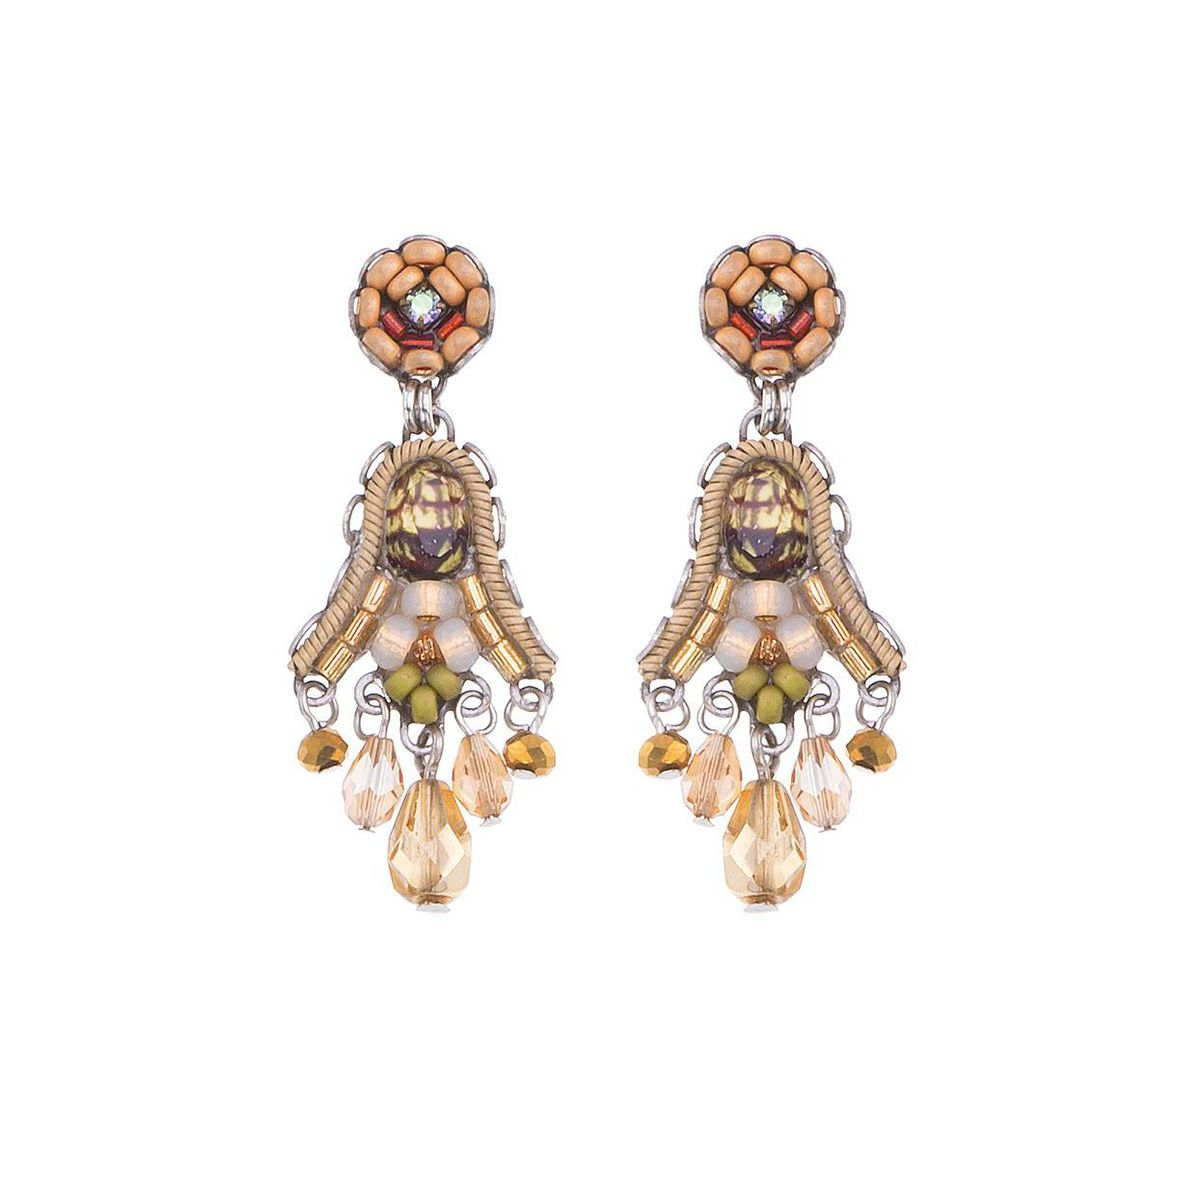 Shifthing Sands, Sandy Earrings Gold AyalaBar